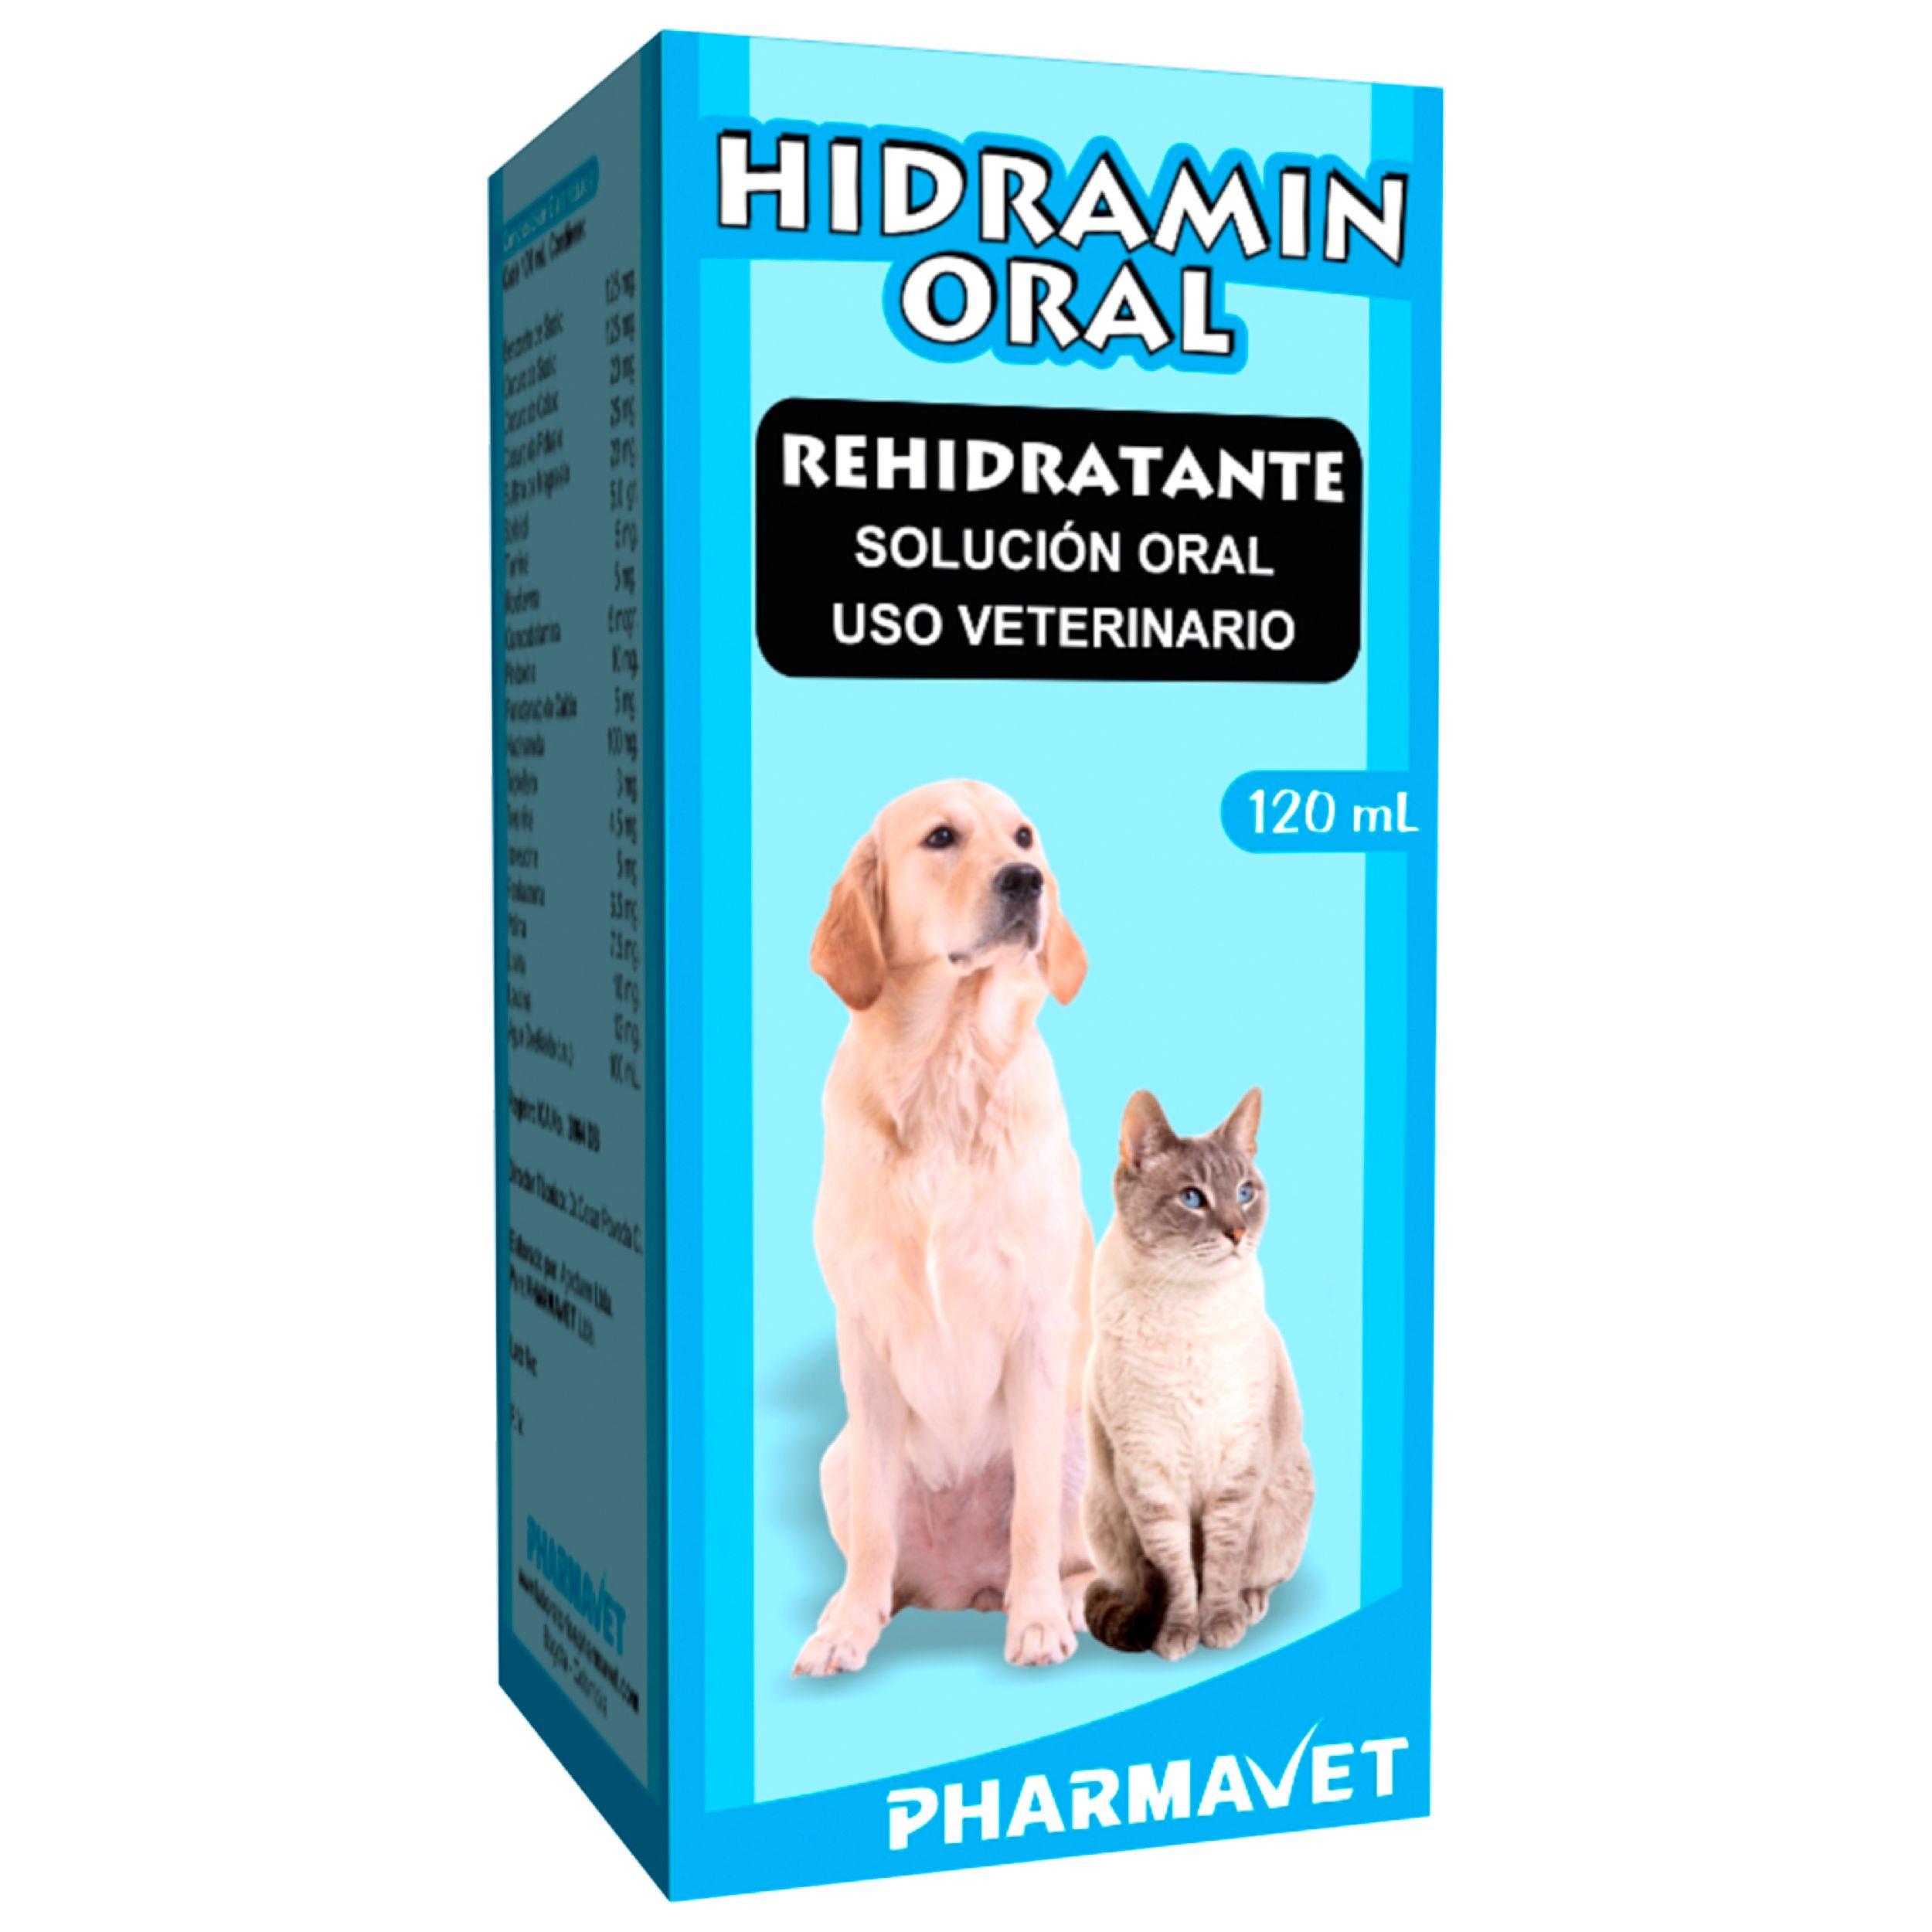 Hidramin Oral